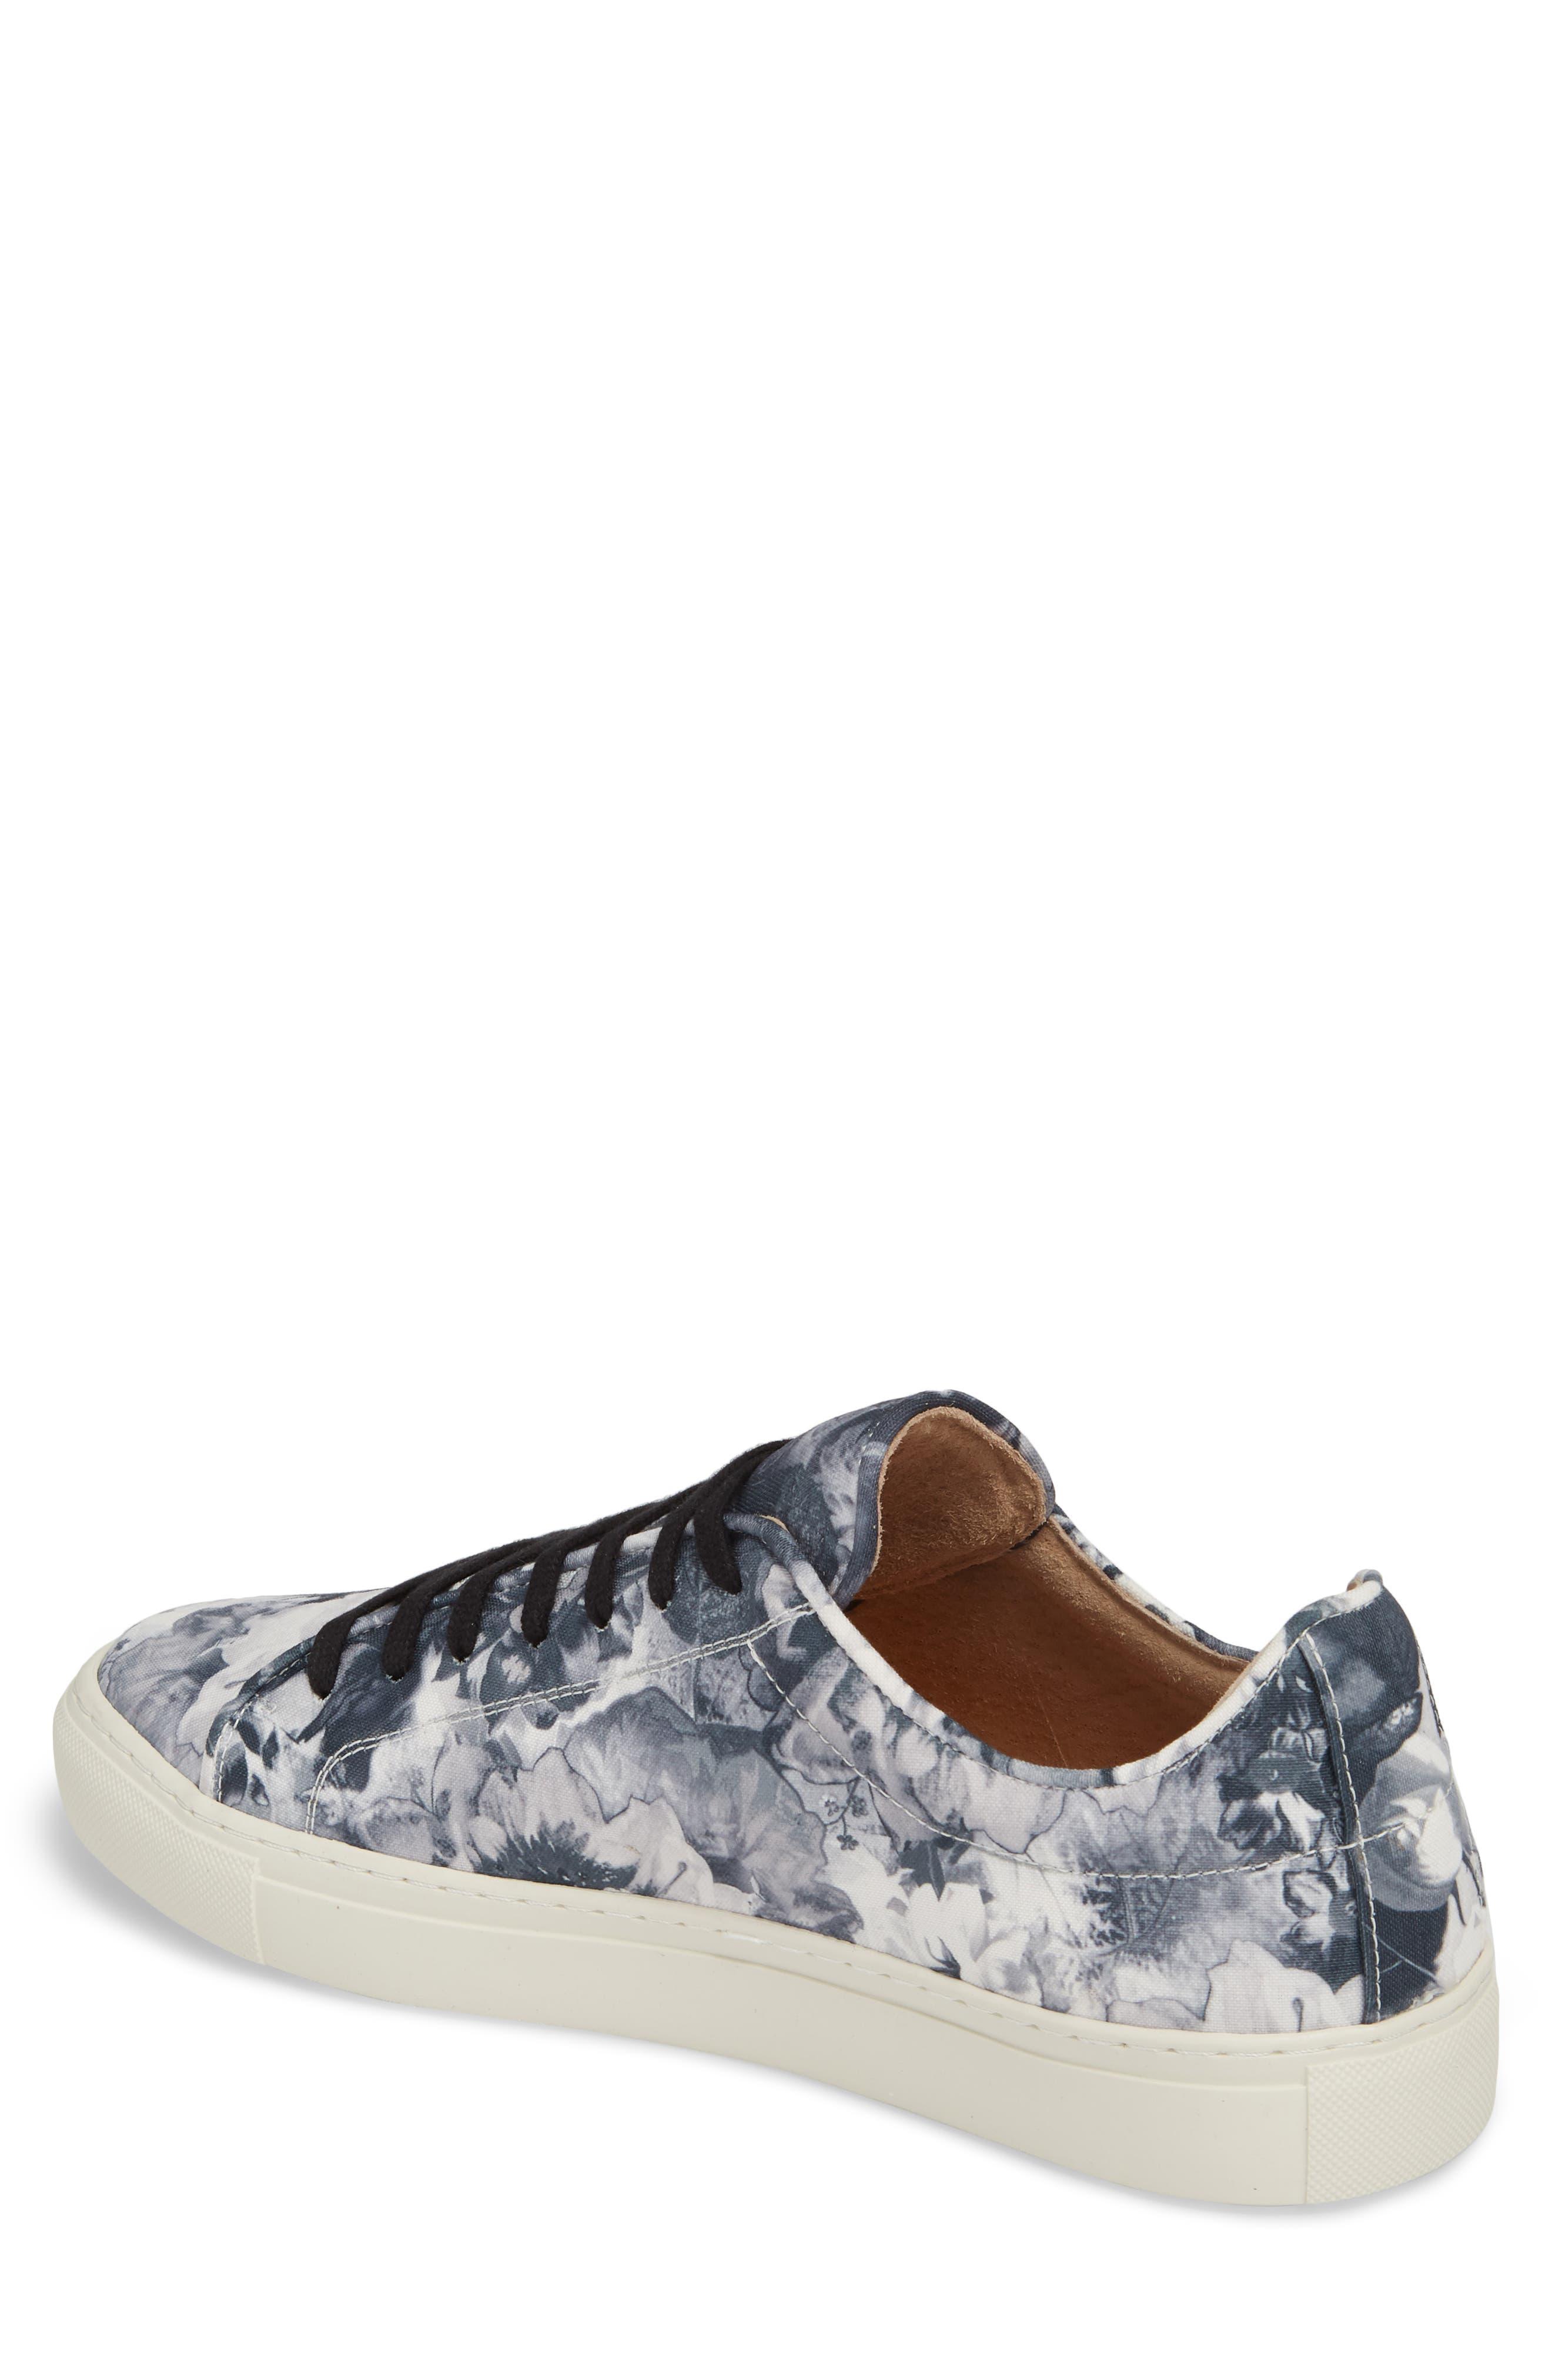 Mason Print Low Top Sneaker,                             Alternate thumbnail 2, color,                             005